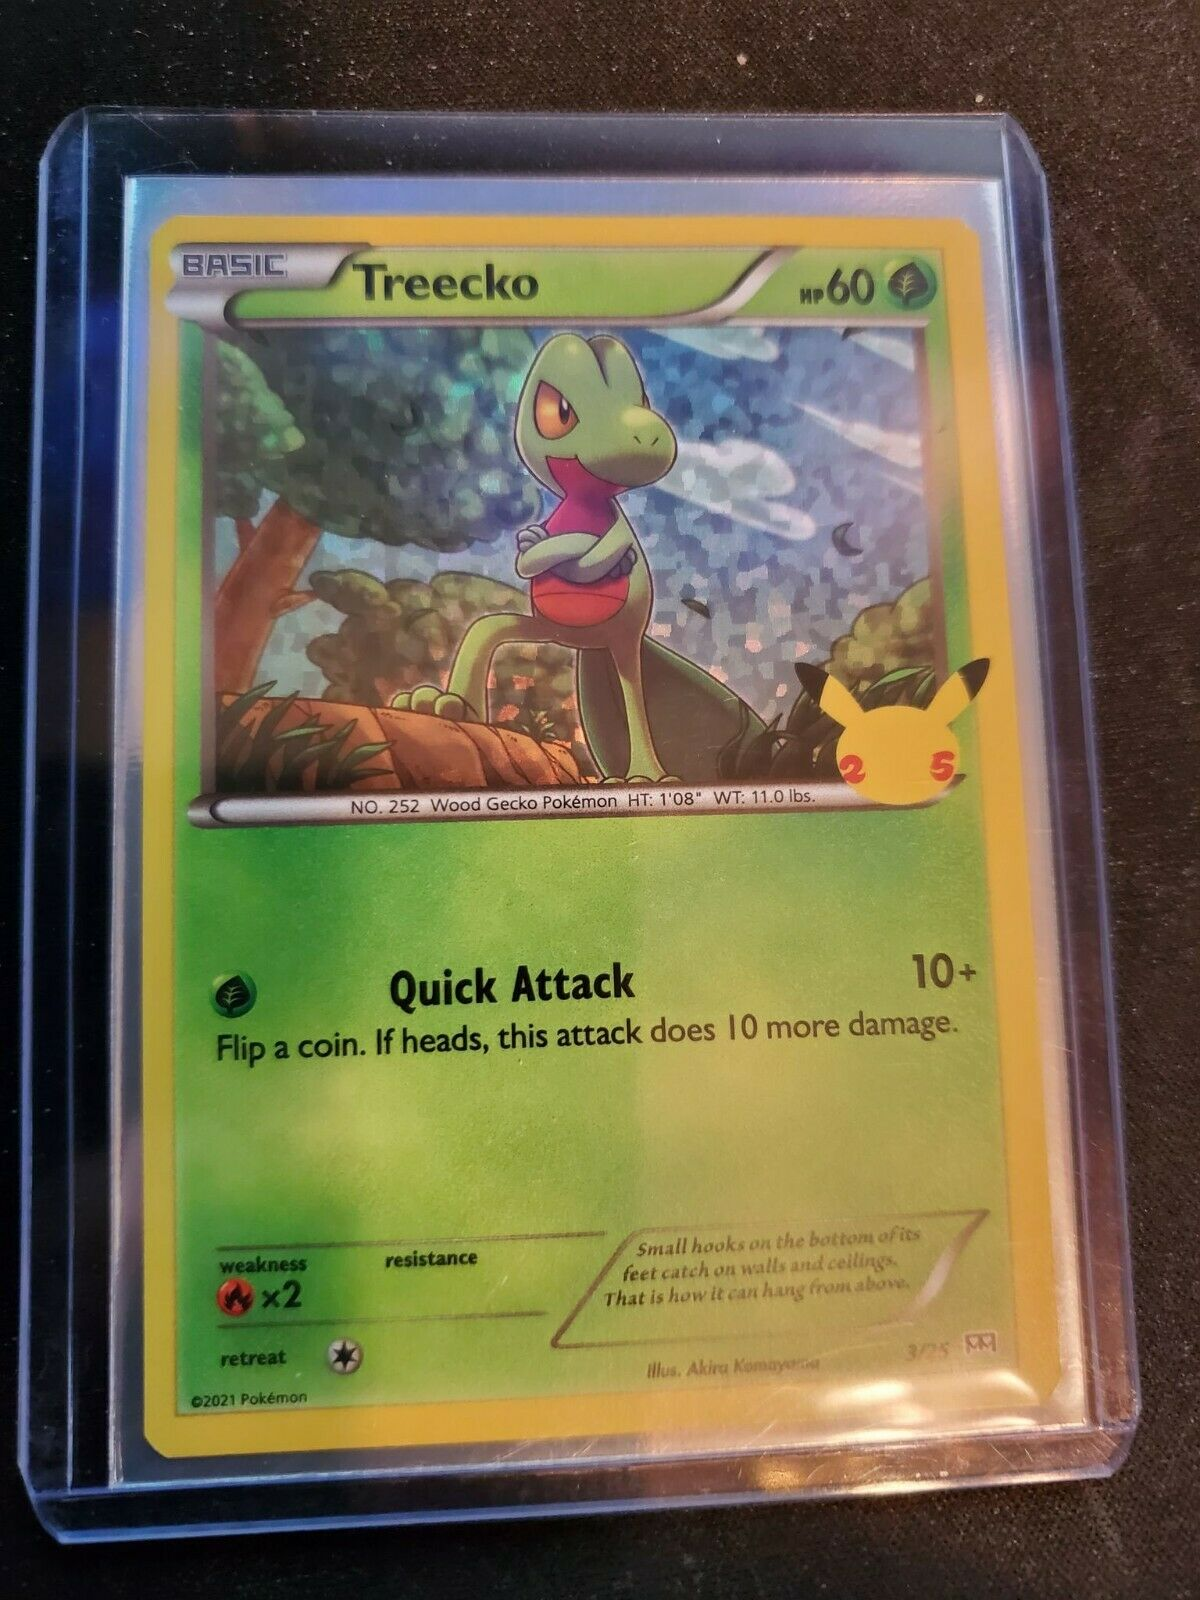 Pokemon Treecko Holo 25th Anniversary McDonald's Card 3/25 - Image 1